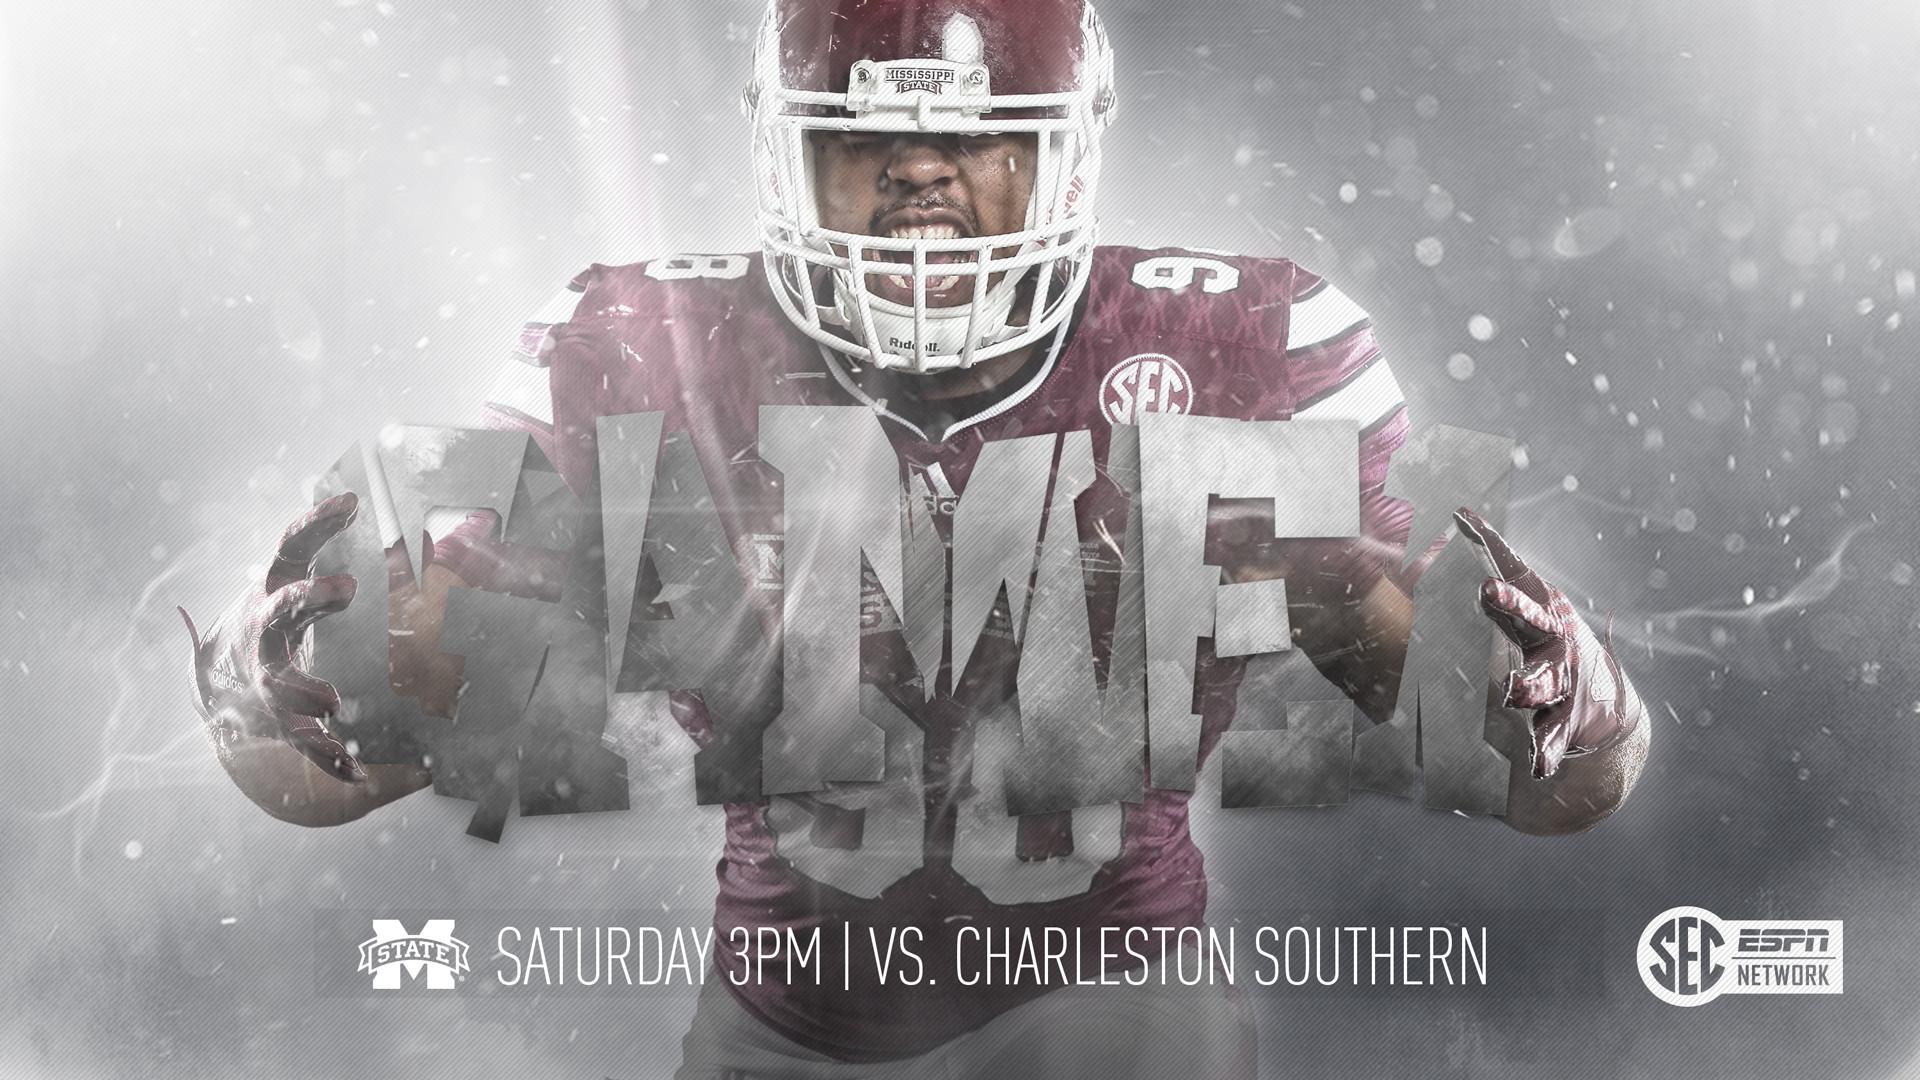 Gameday: MSU Begins 118th Football Season, Welcomes Charleston Southern For  Opener